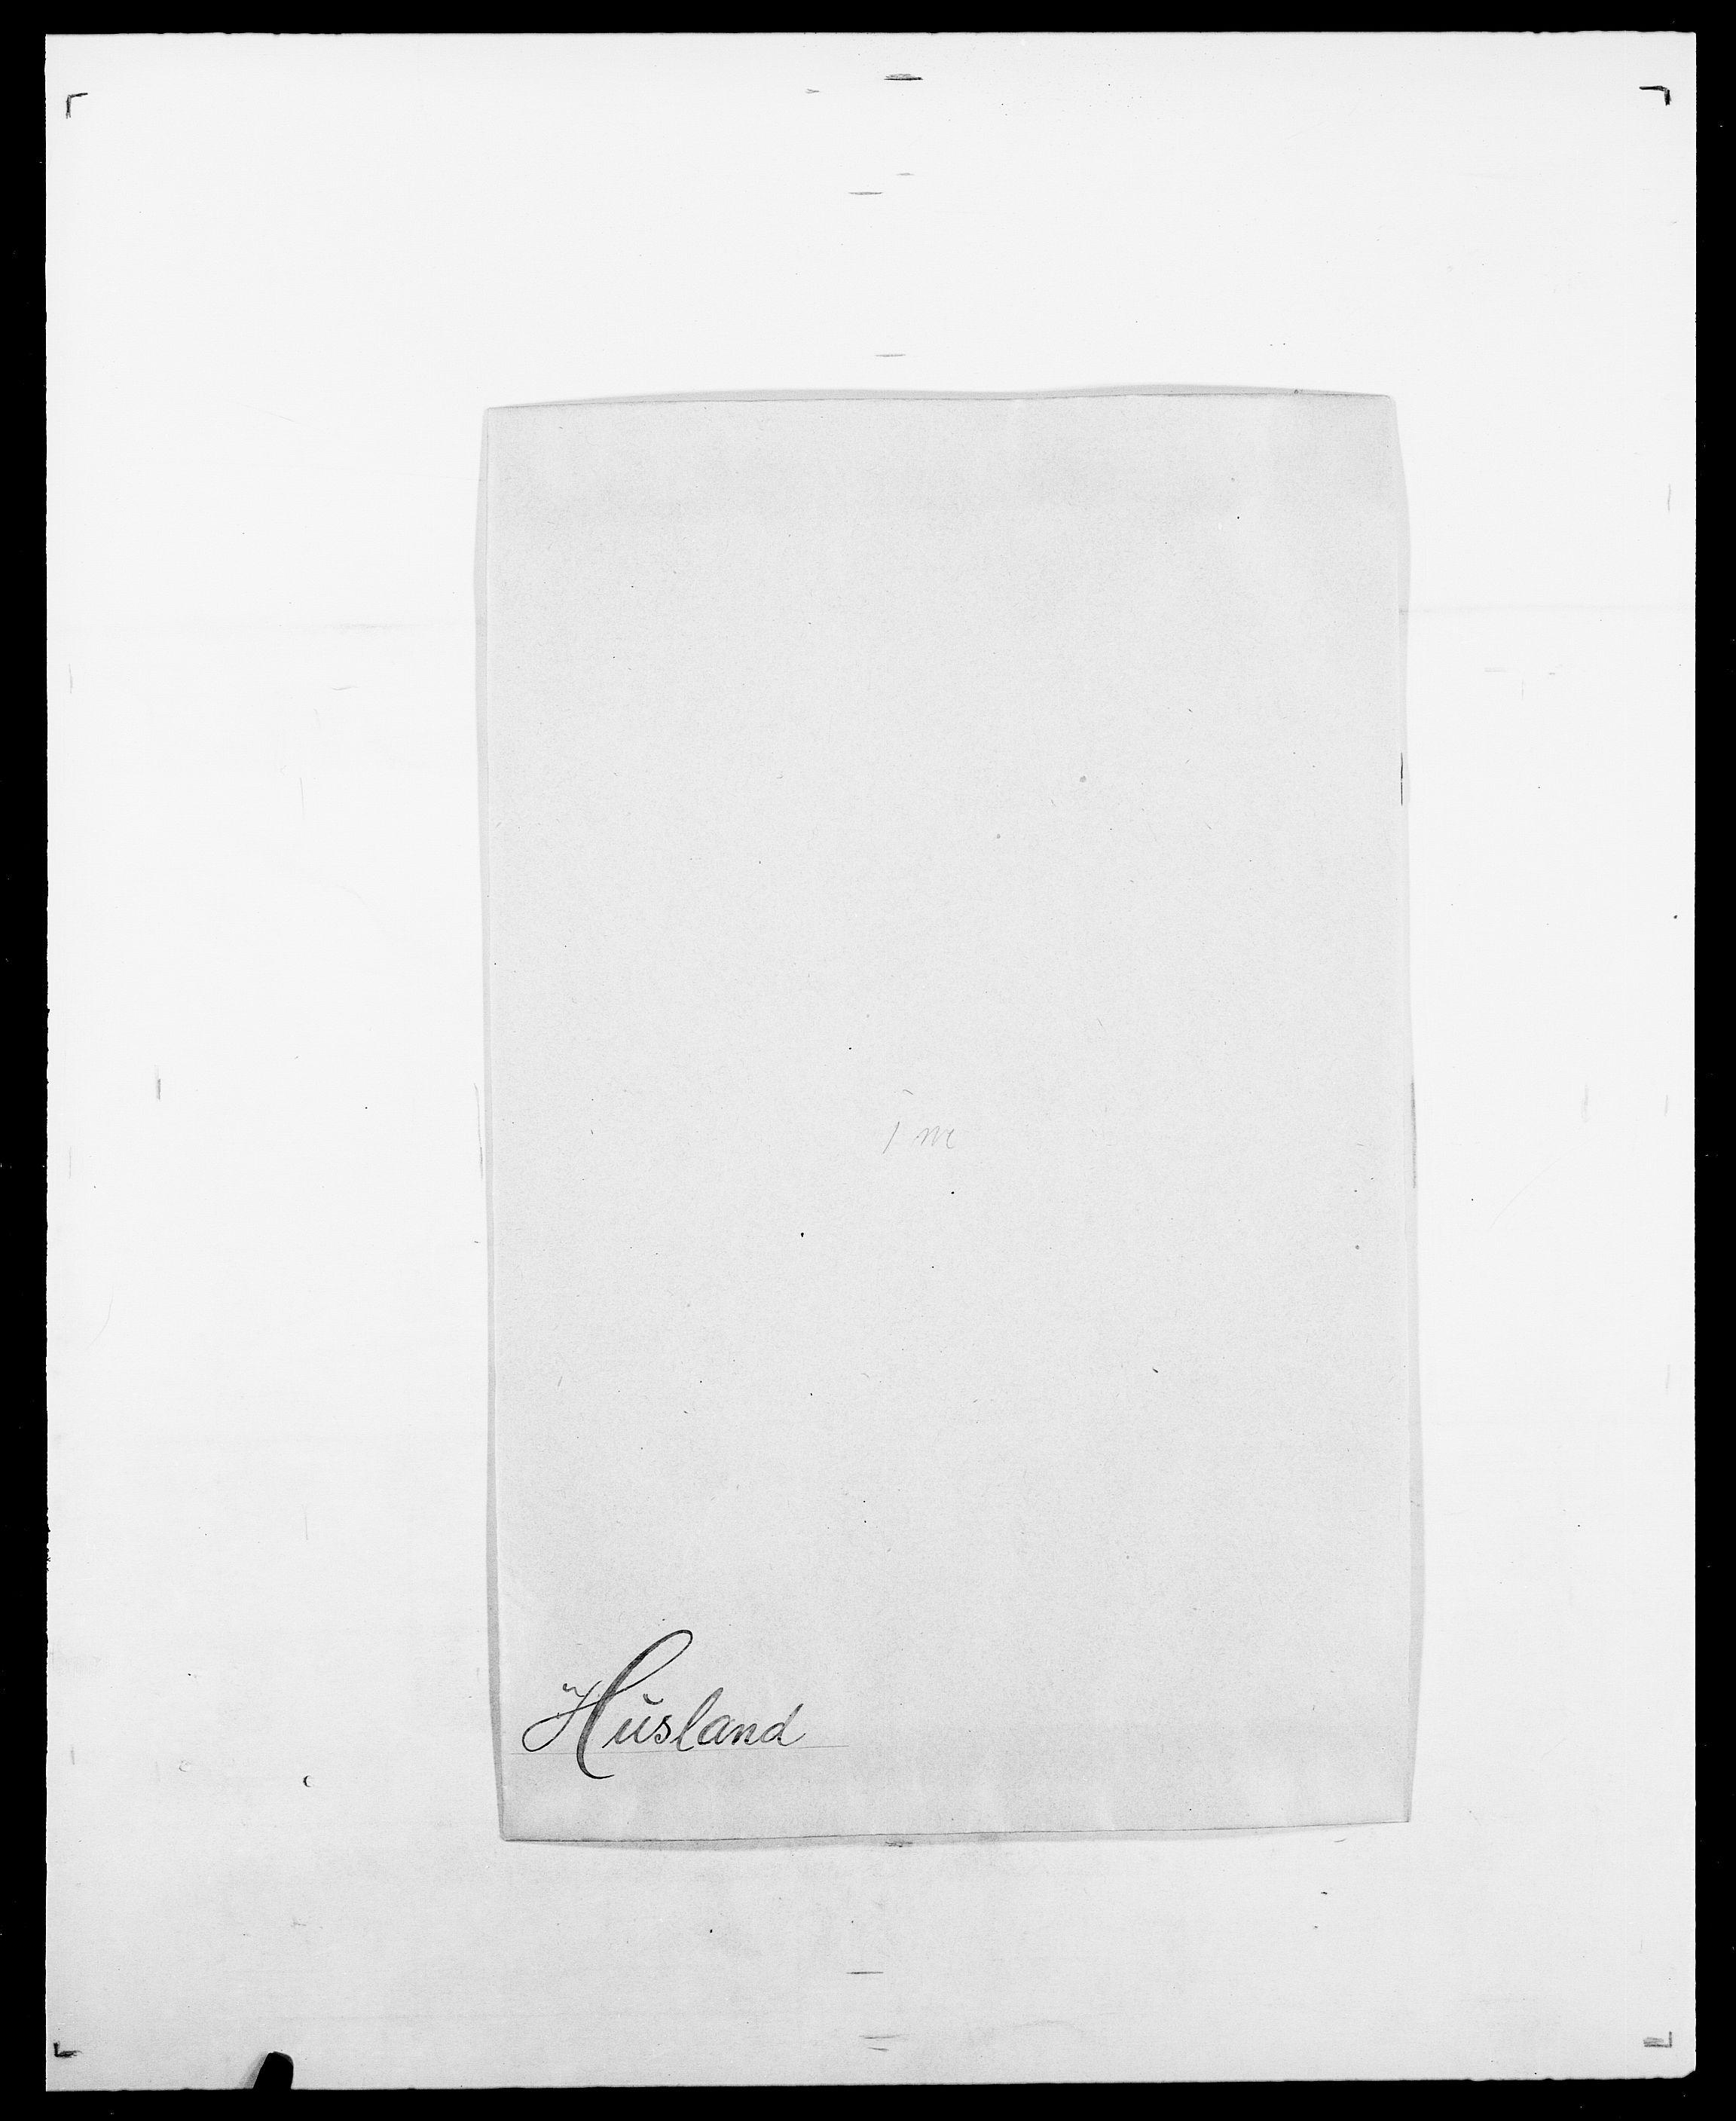 SAO, Delgobe, Charles Antoine - samling, D/Da/L0019: van der Hude - Joys, s. 87